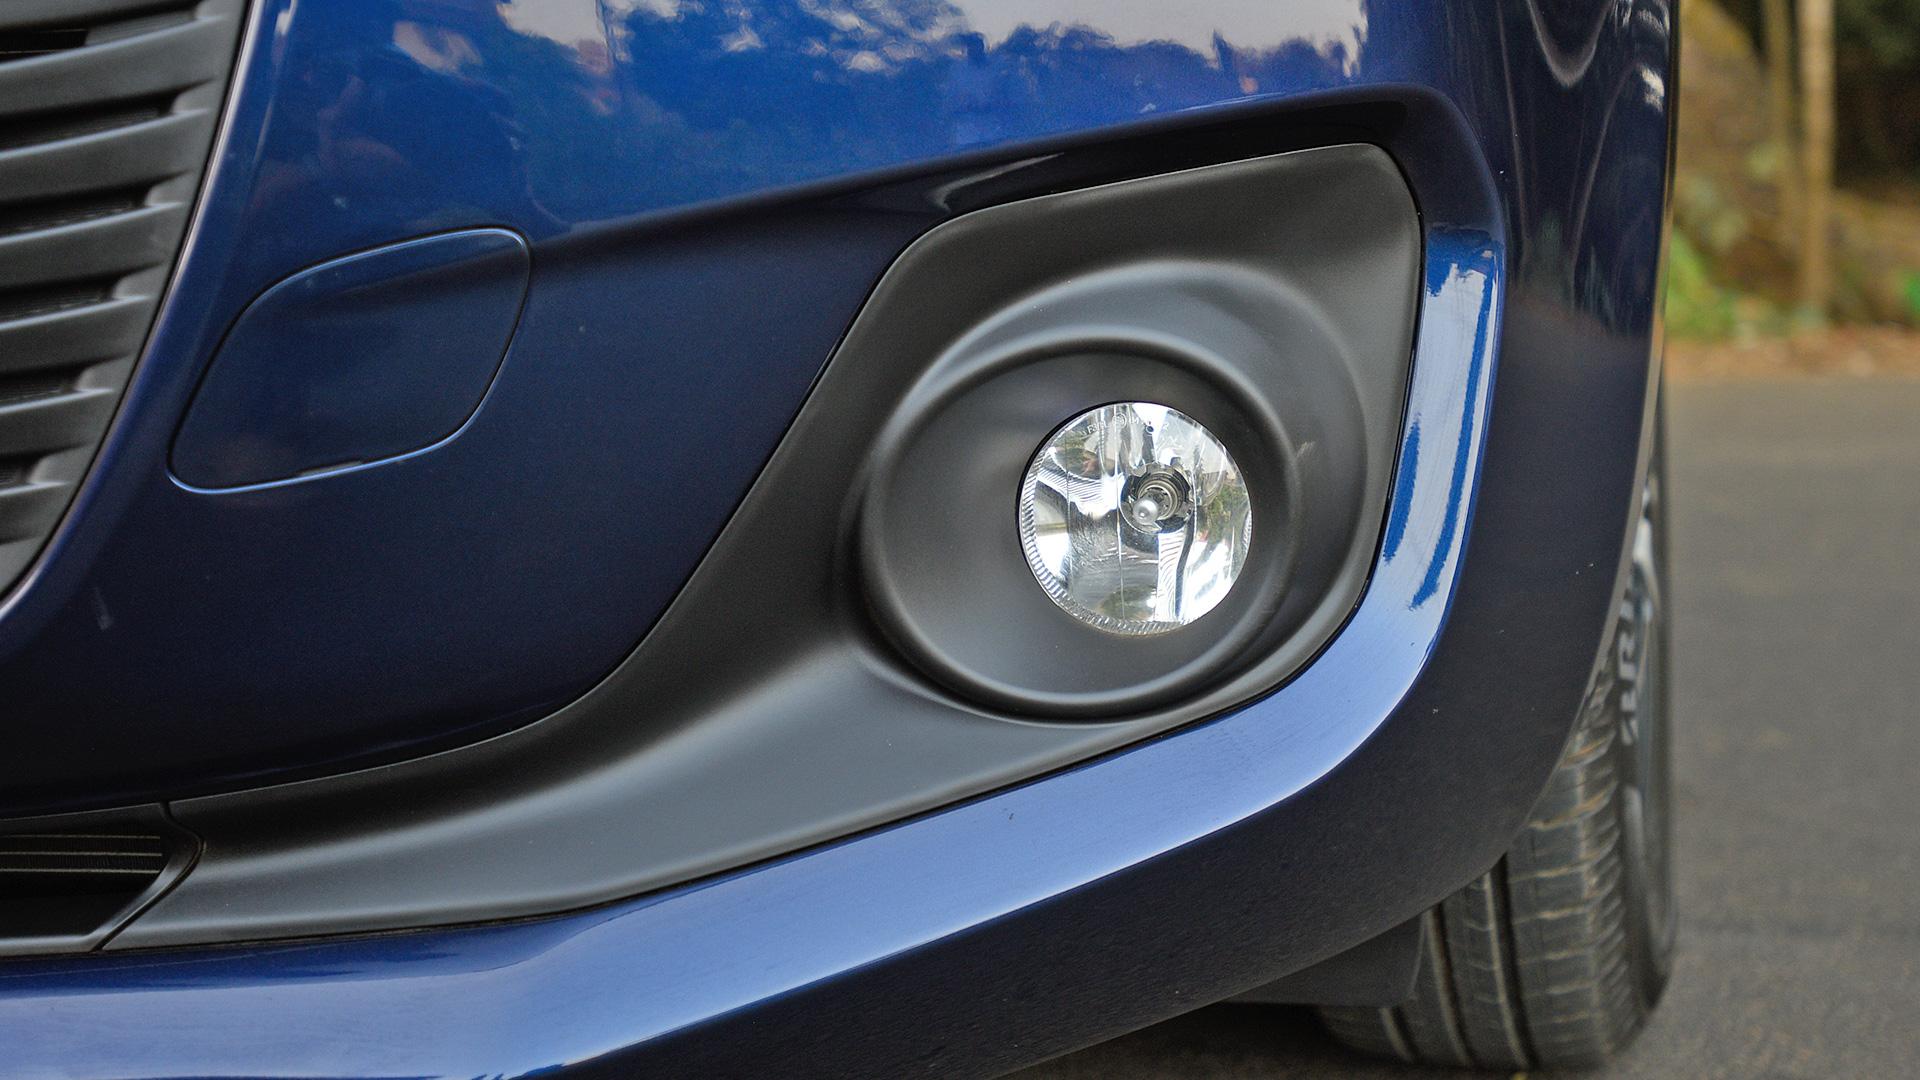 Maruti Suzuki Swift 2018 Zdi - Price, Mileage, Reviews